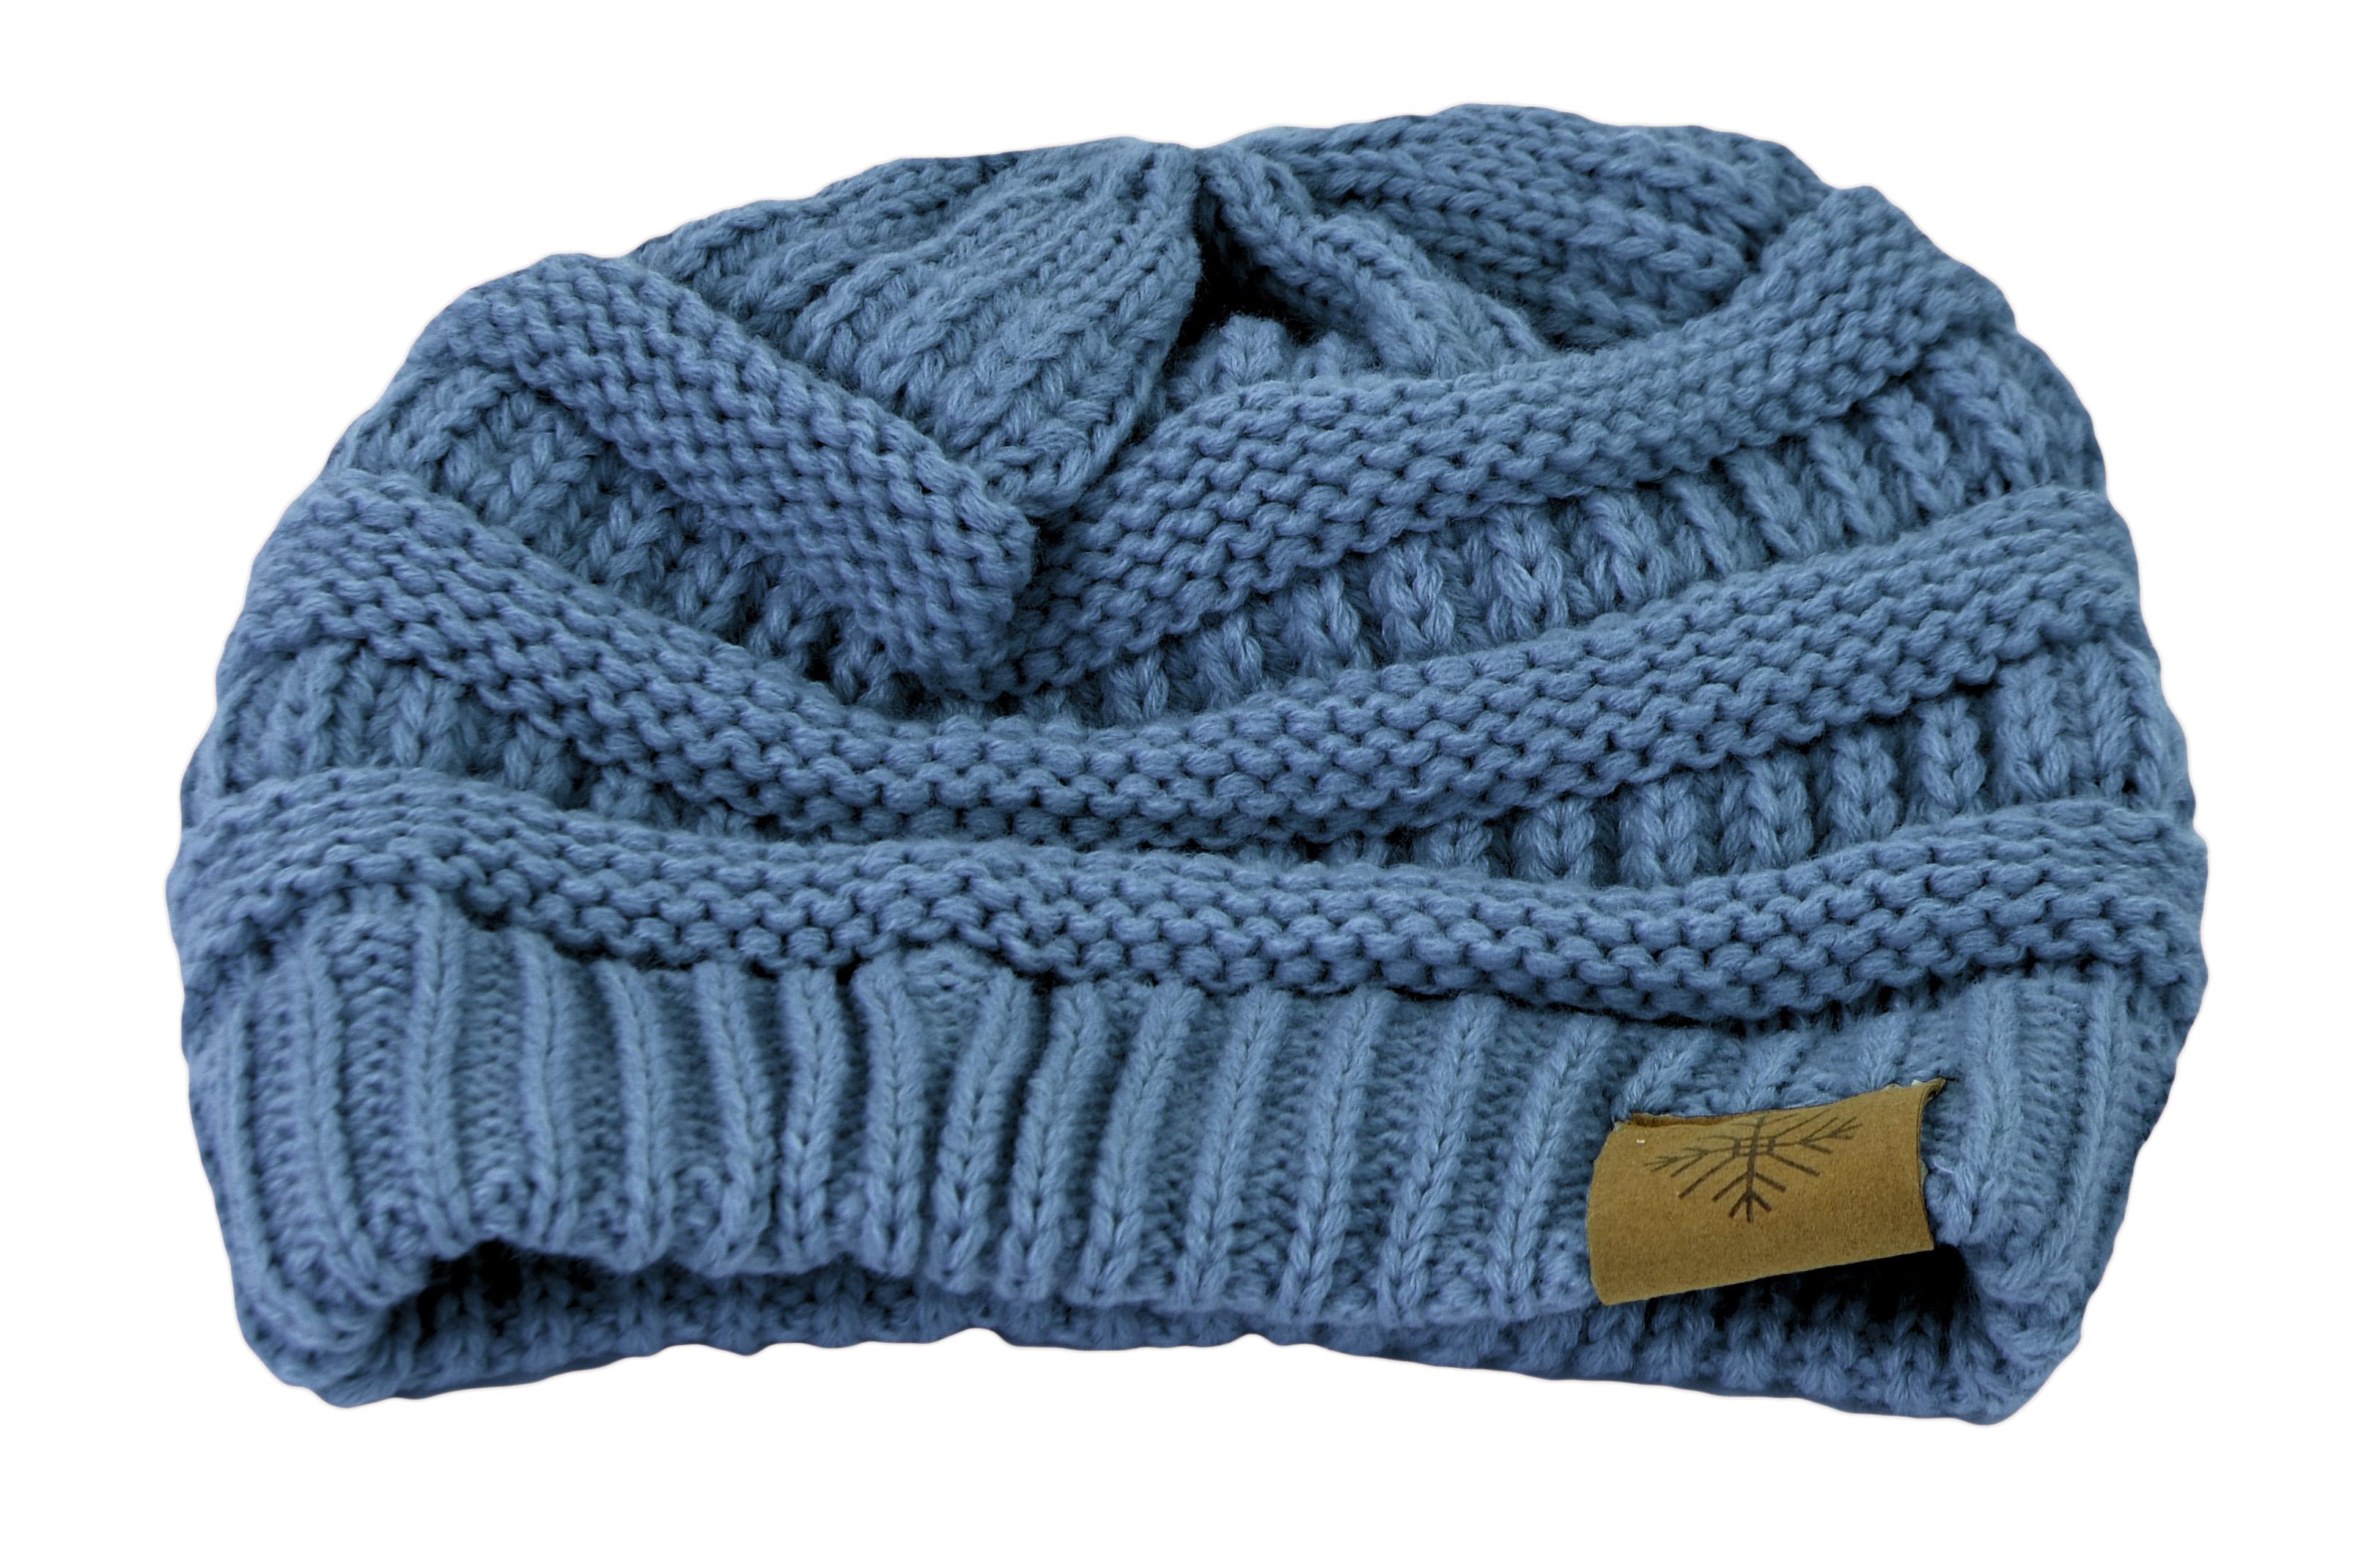 Belle Donne - Women's Winter Fleece Lined Cable Knitted Pom Pom Beanie Hat - INDI BLUE-II